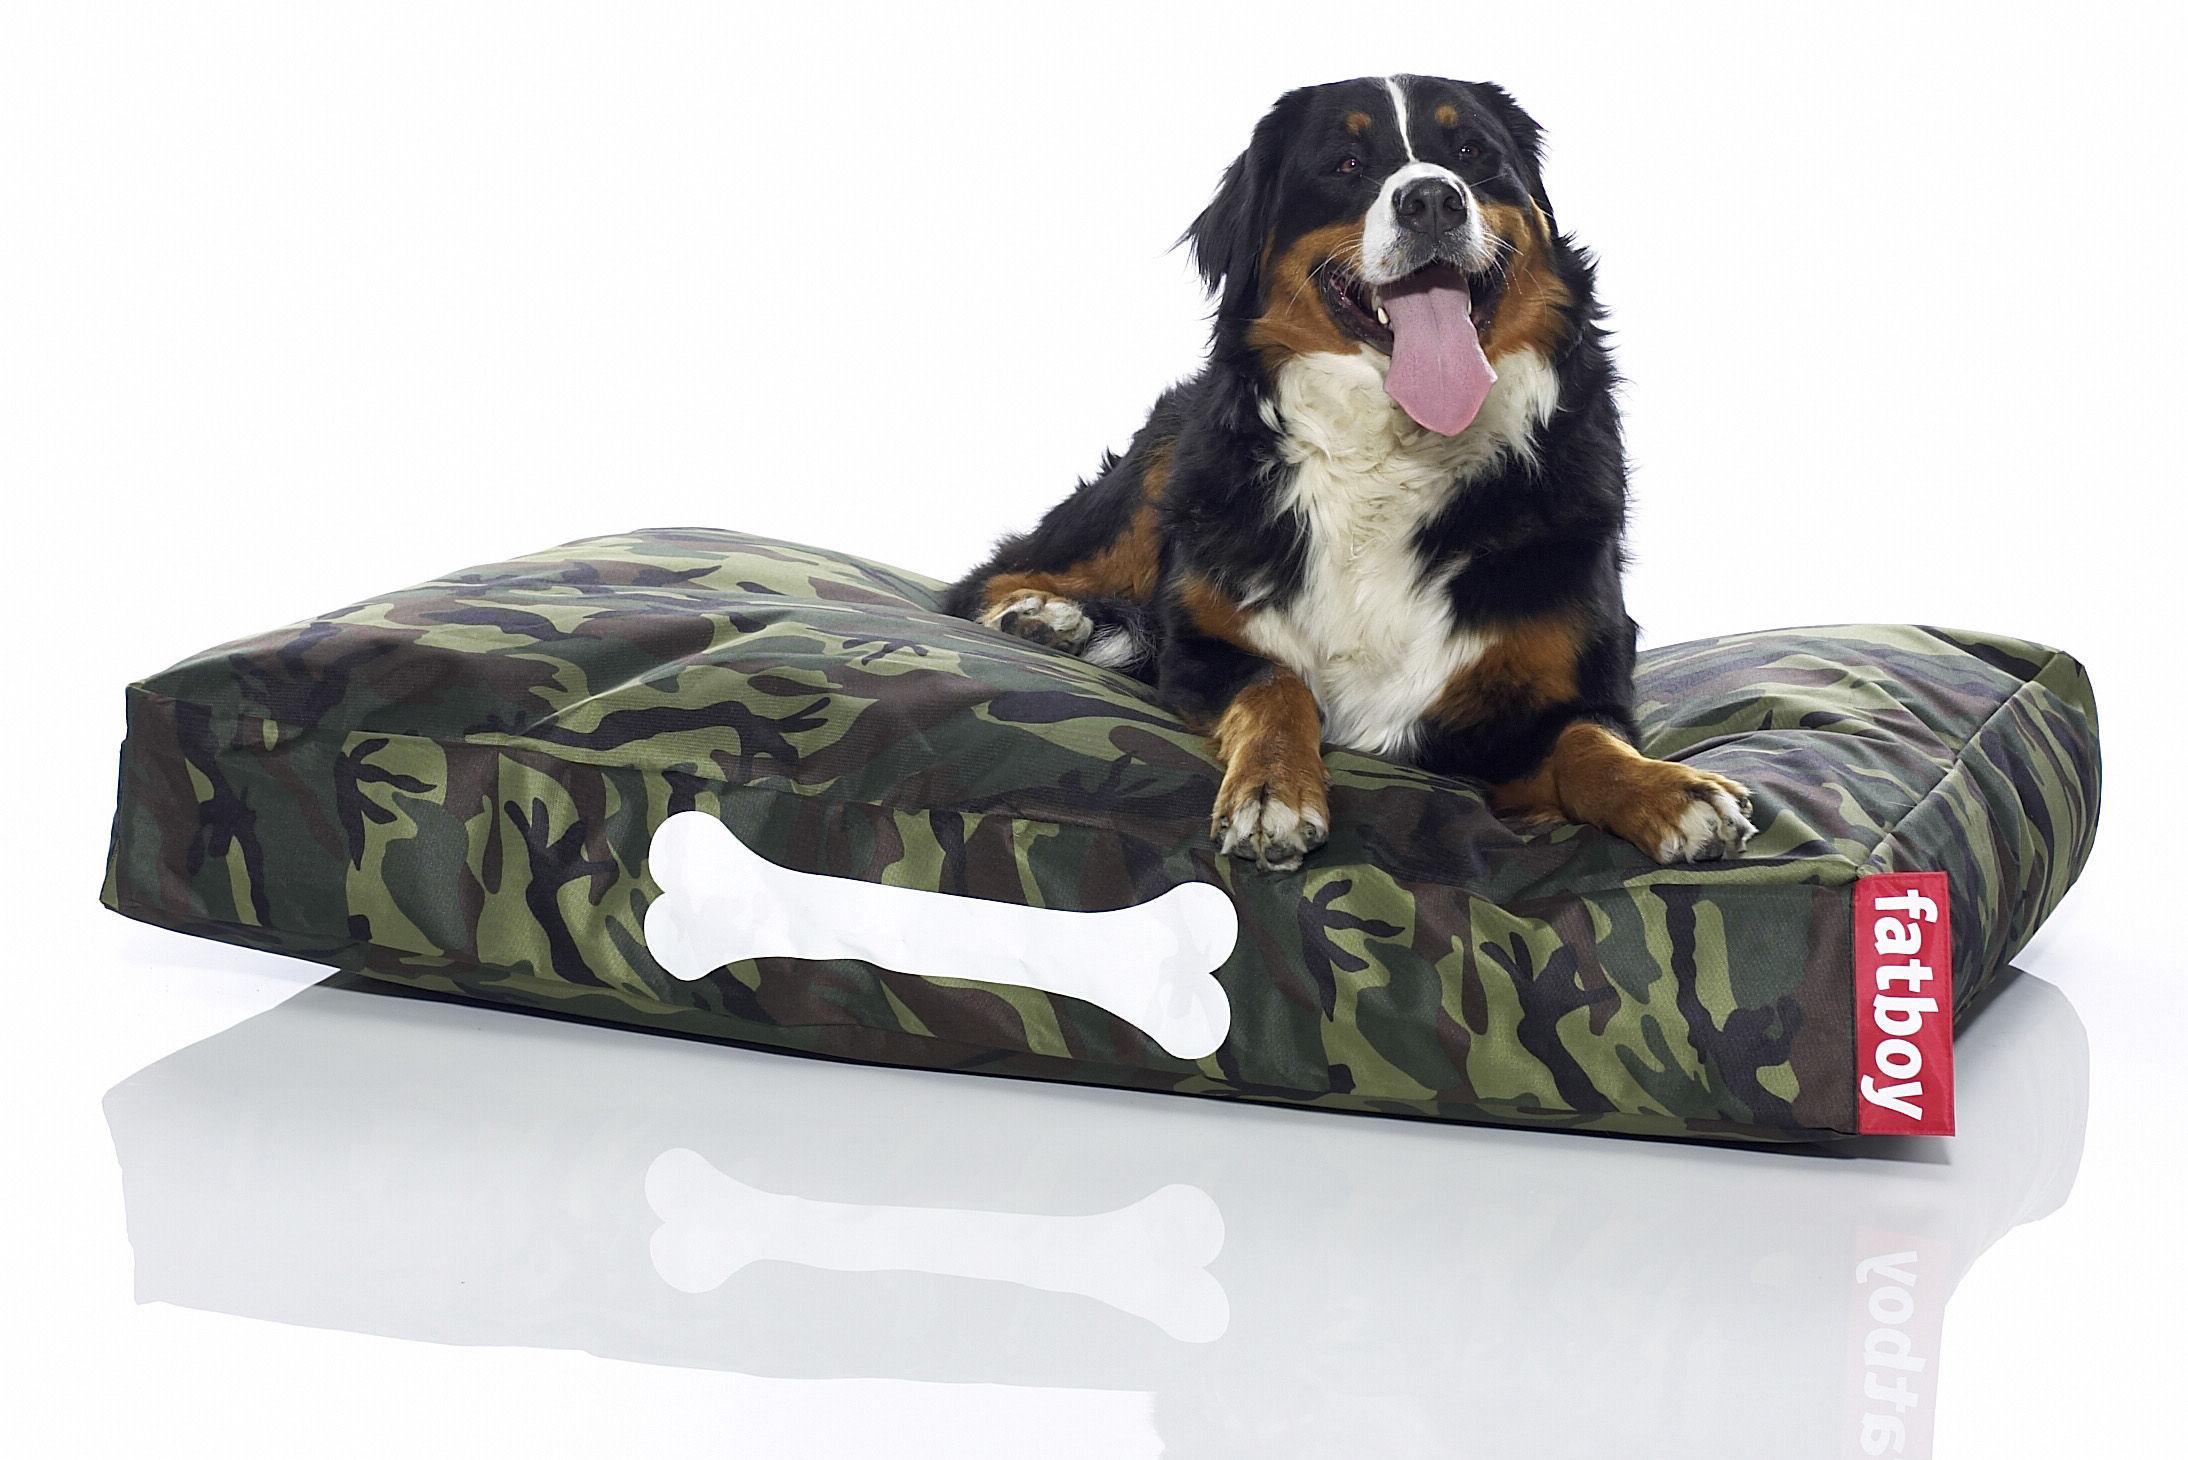 pouf doggielounge pour chien large camouflage fatboy. Black Bedroom Furniture Sets. Home Design Ideas